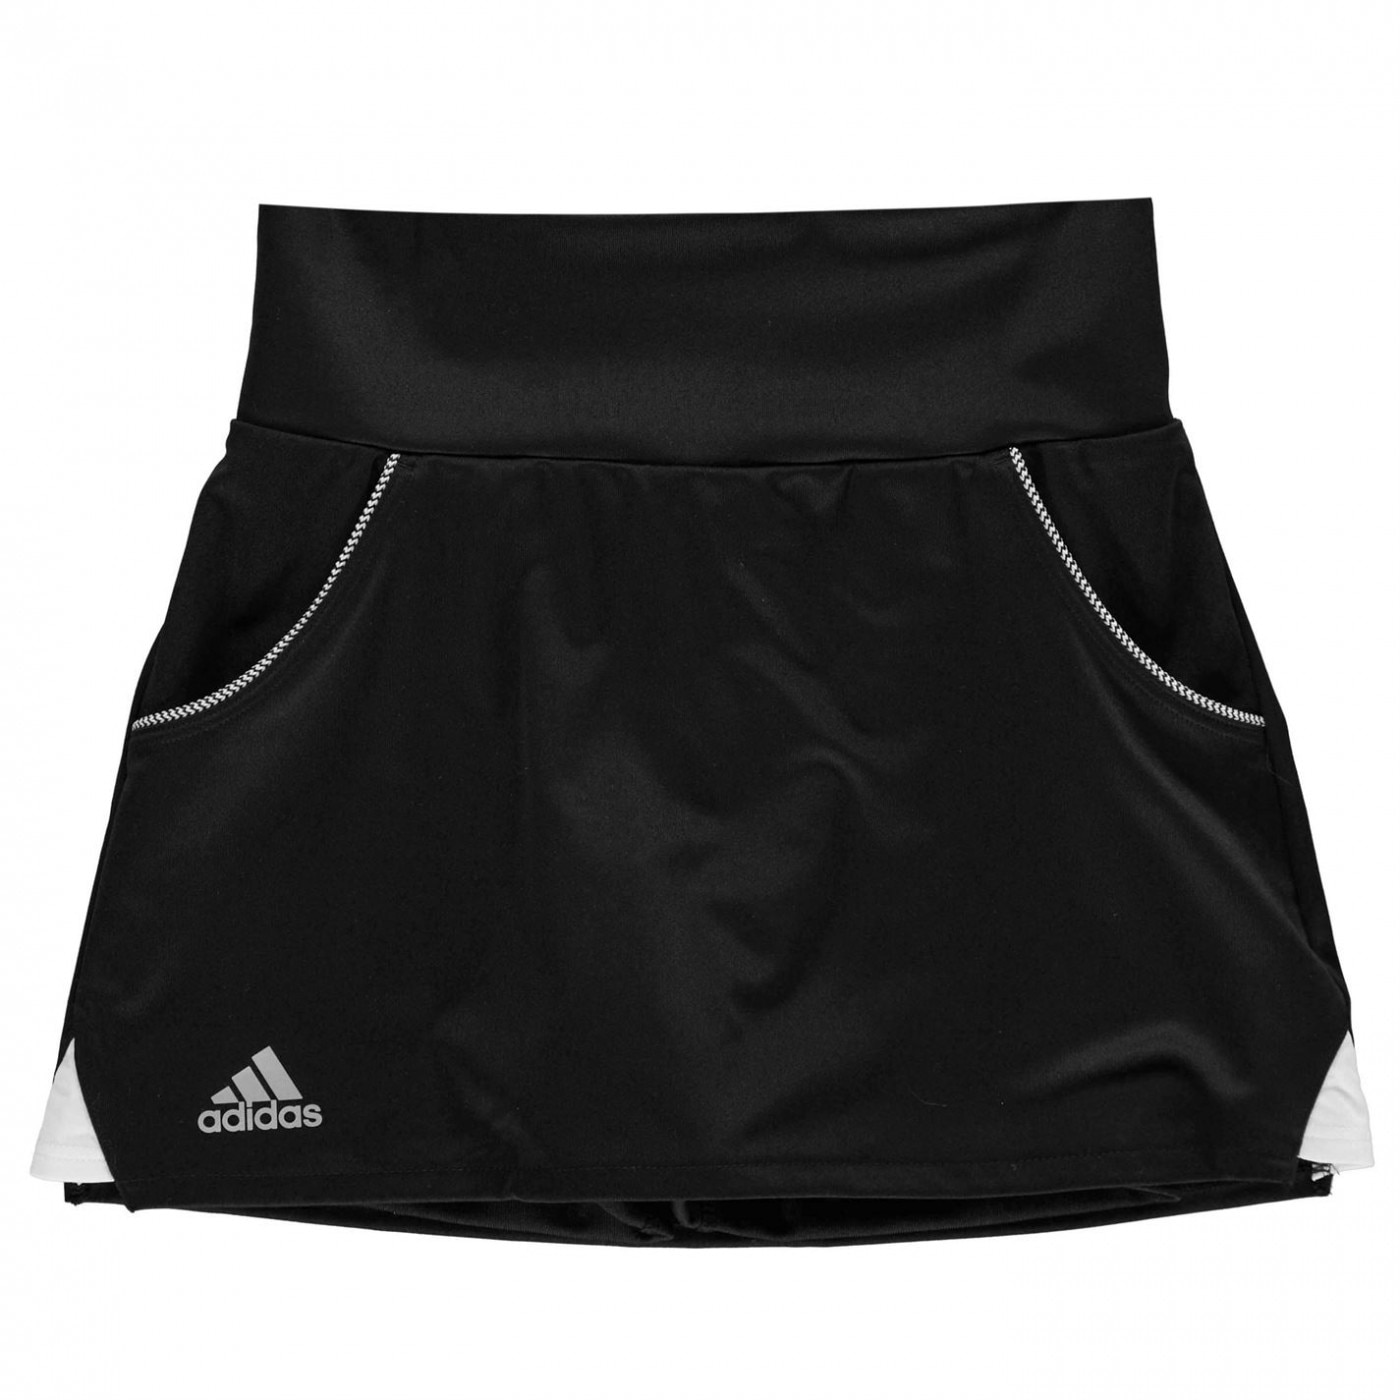 Adidas Club Skort Junior Girls